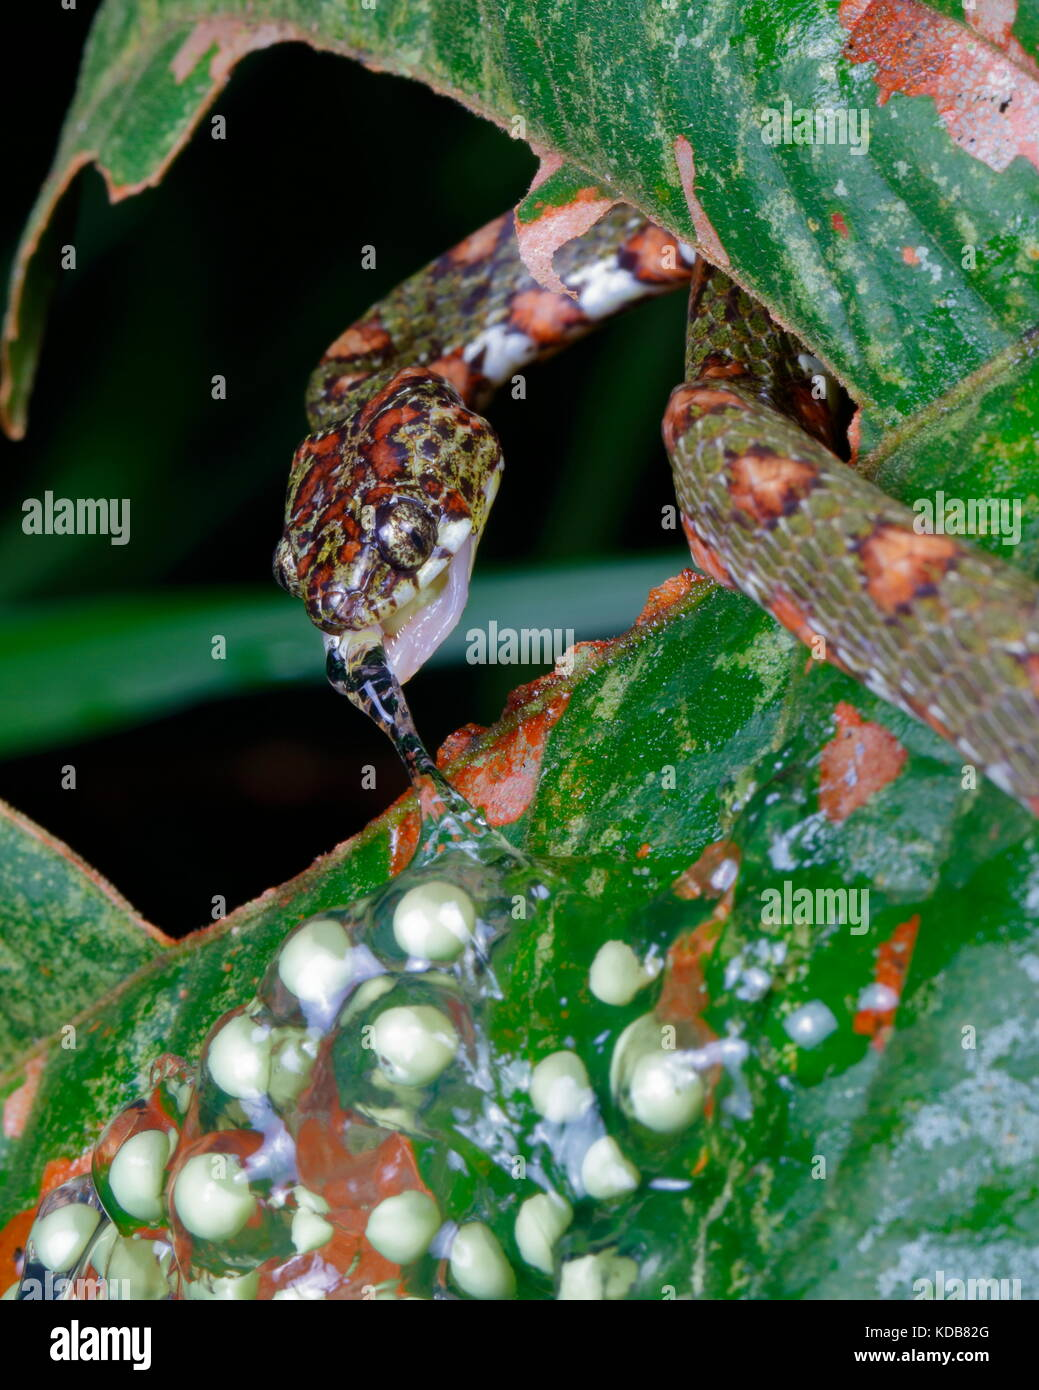 Una lumaca Argus ventosa, Sibon argus, alimentando su red eyed raganella uova. Immagini Stock